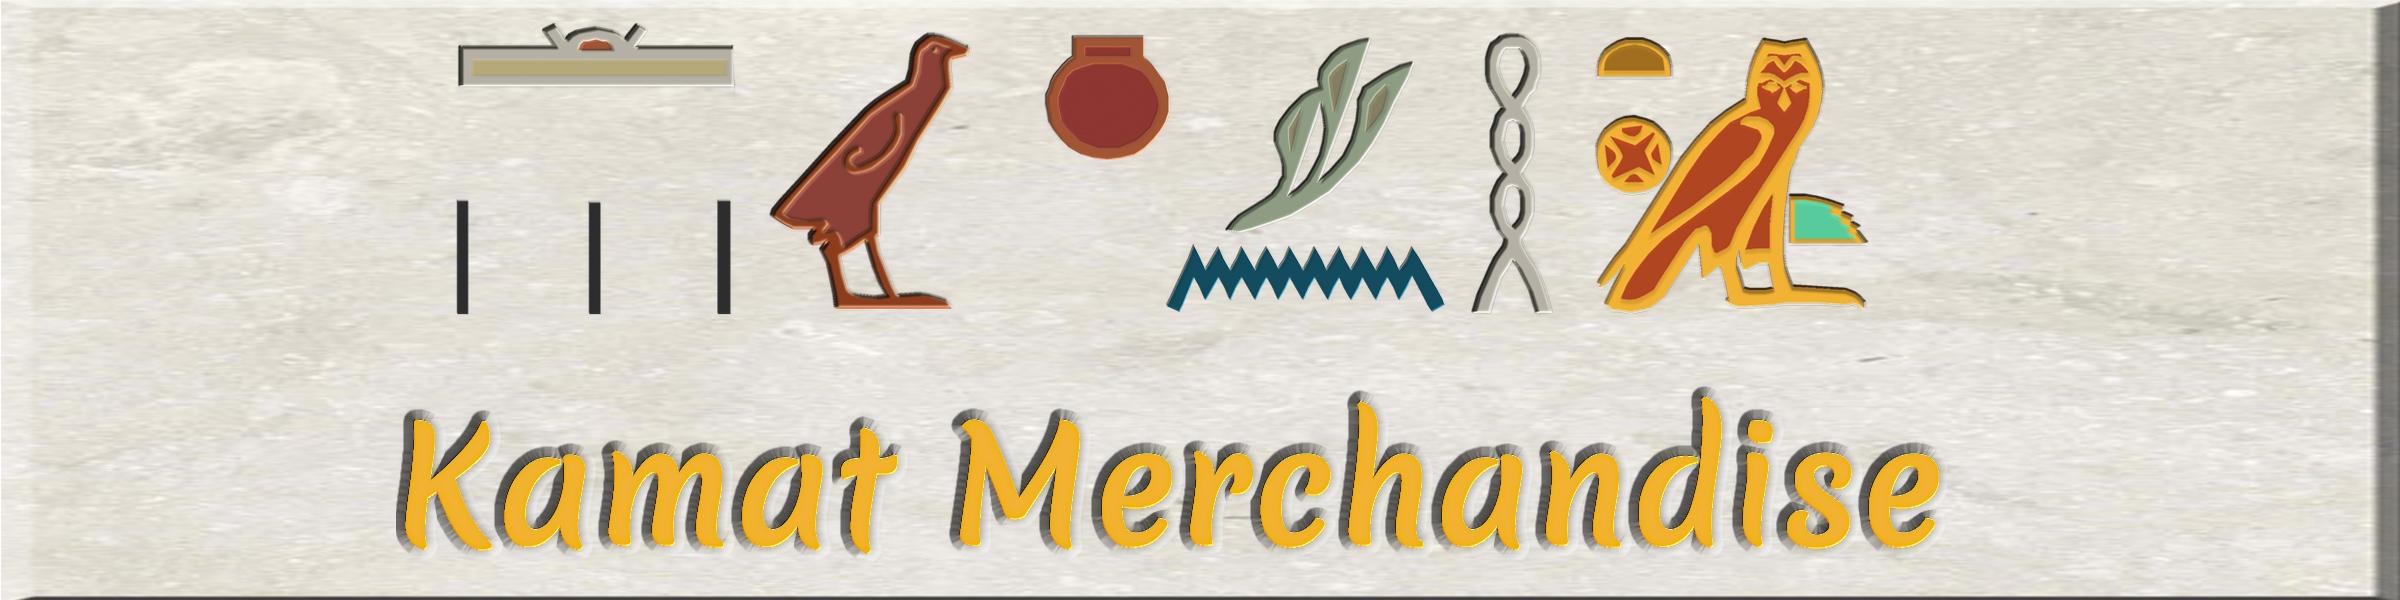 Kamat Merchandise Logo